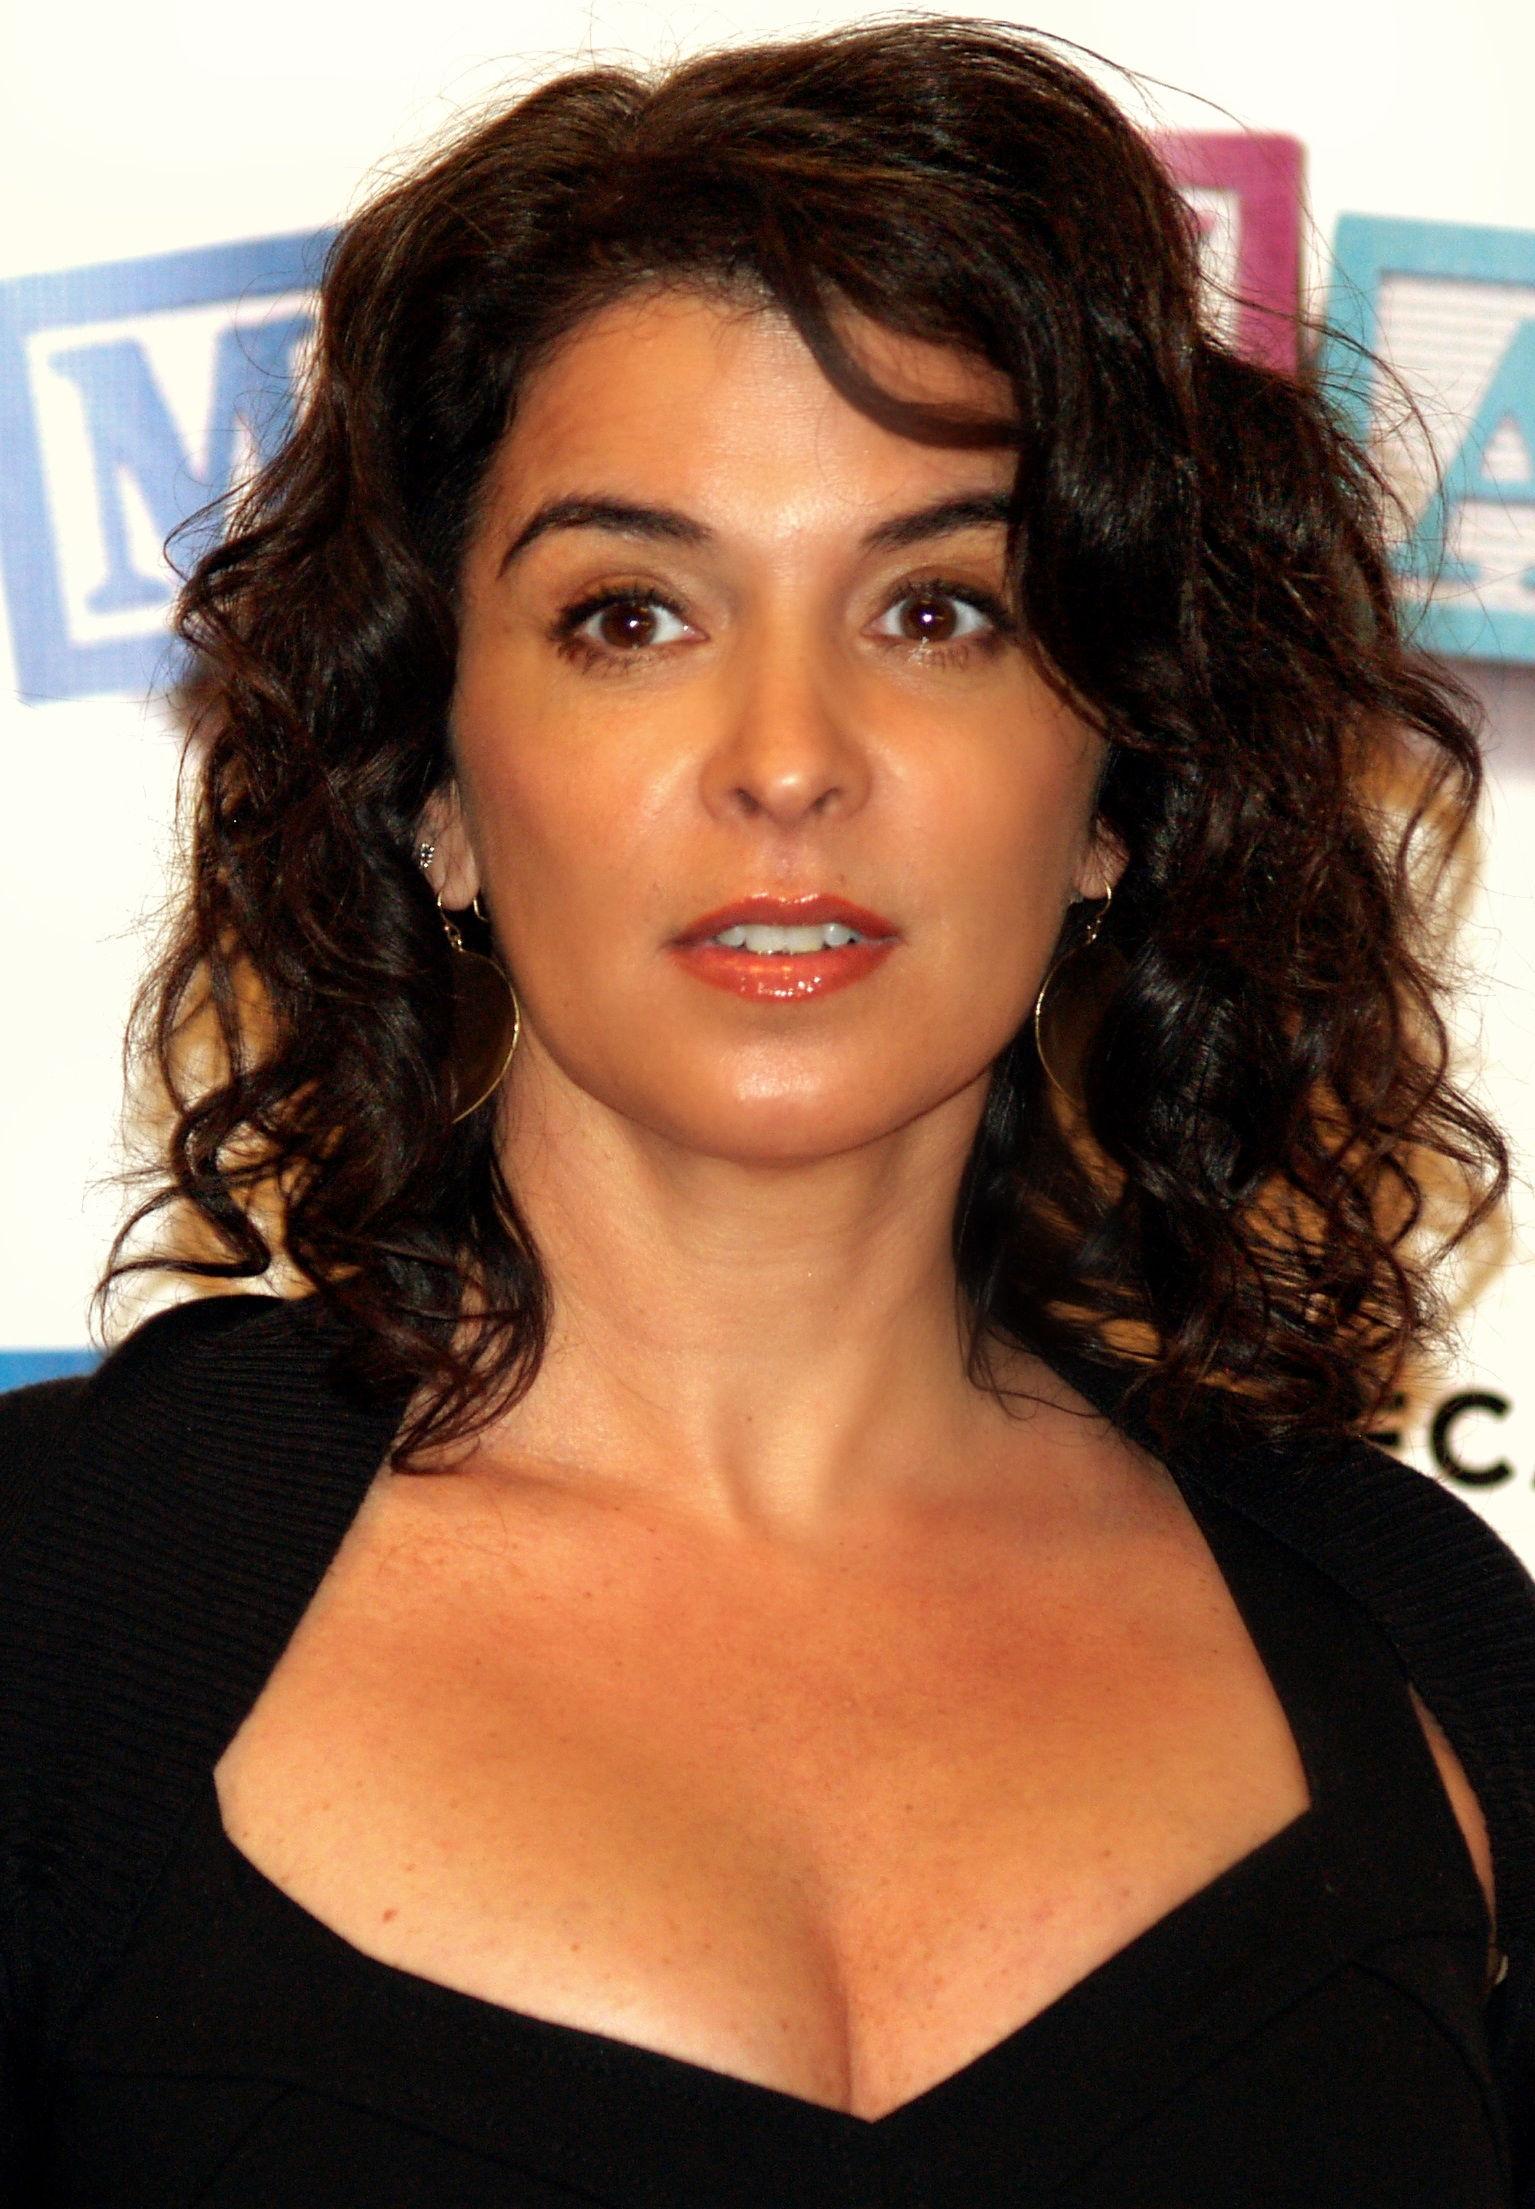 Photo of Annabella Sciorra: American actress